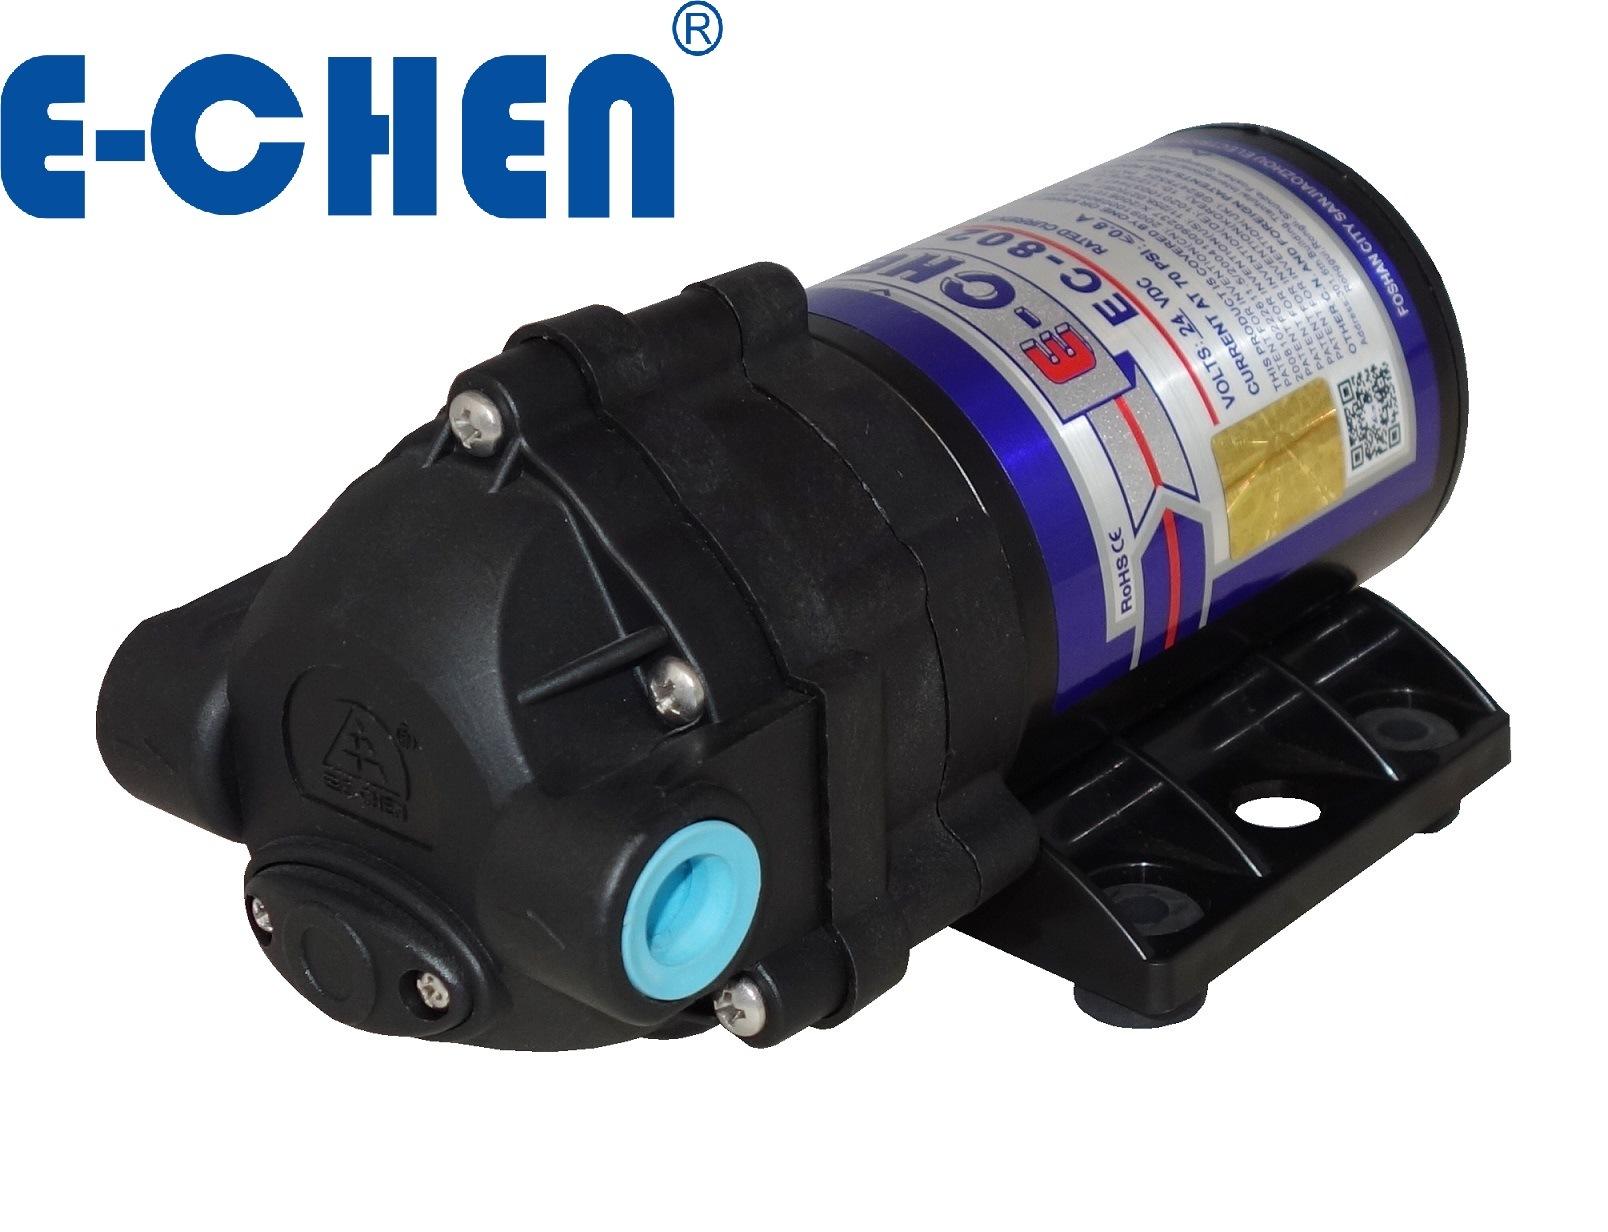 E-Chen 802 Series 50gpd Compact Diaphragm RO Booster Water Pump